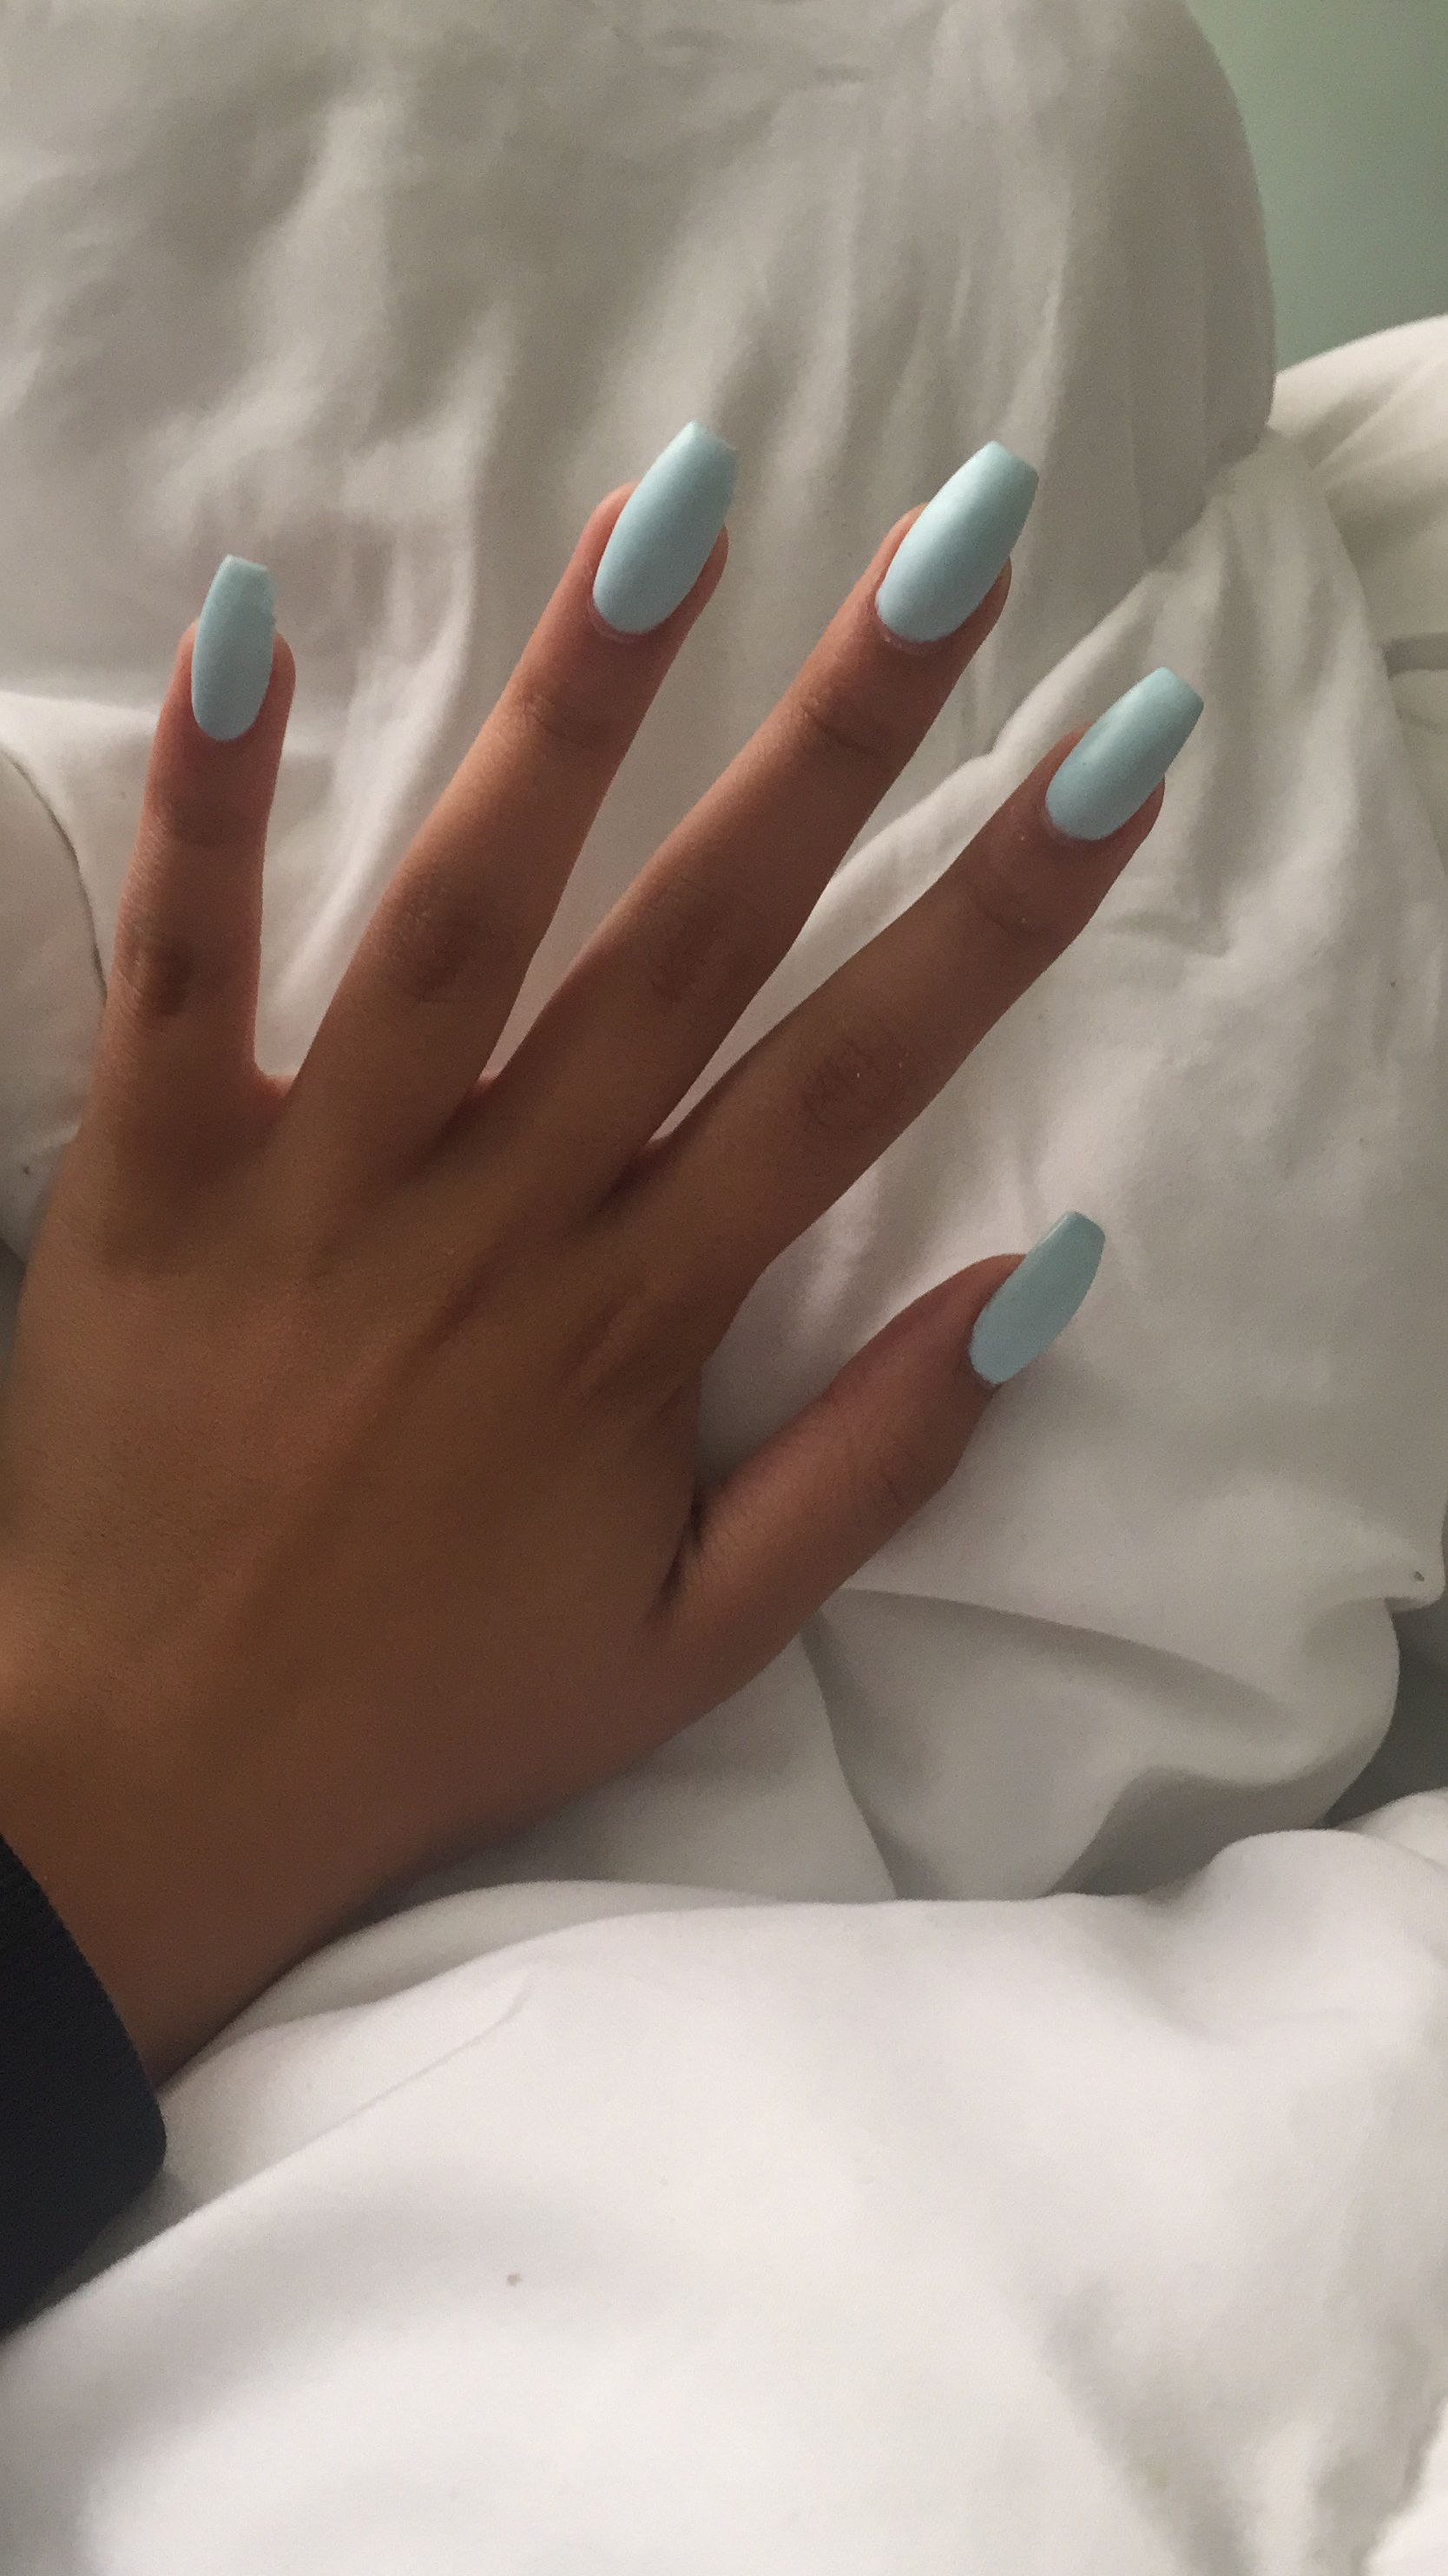 Pin By Alice In Wonderland On Nails With Images Barevne Nehty Gelove Nehty Nehty